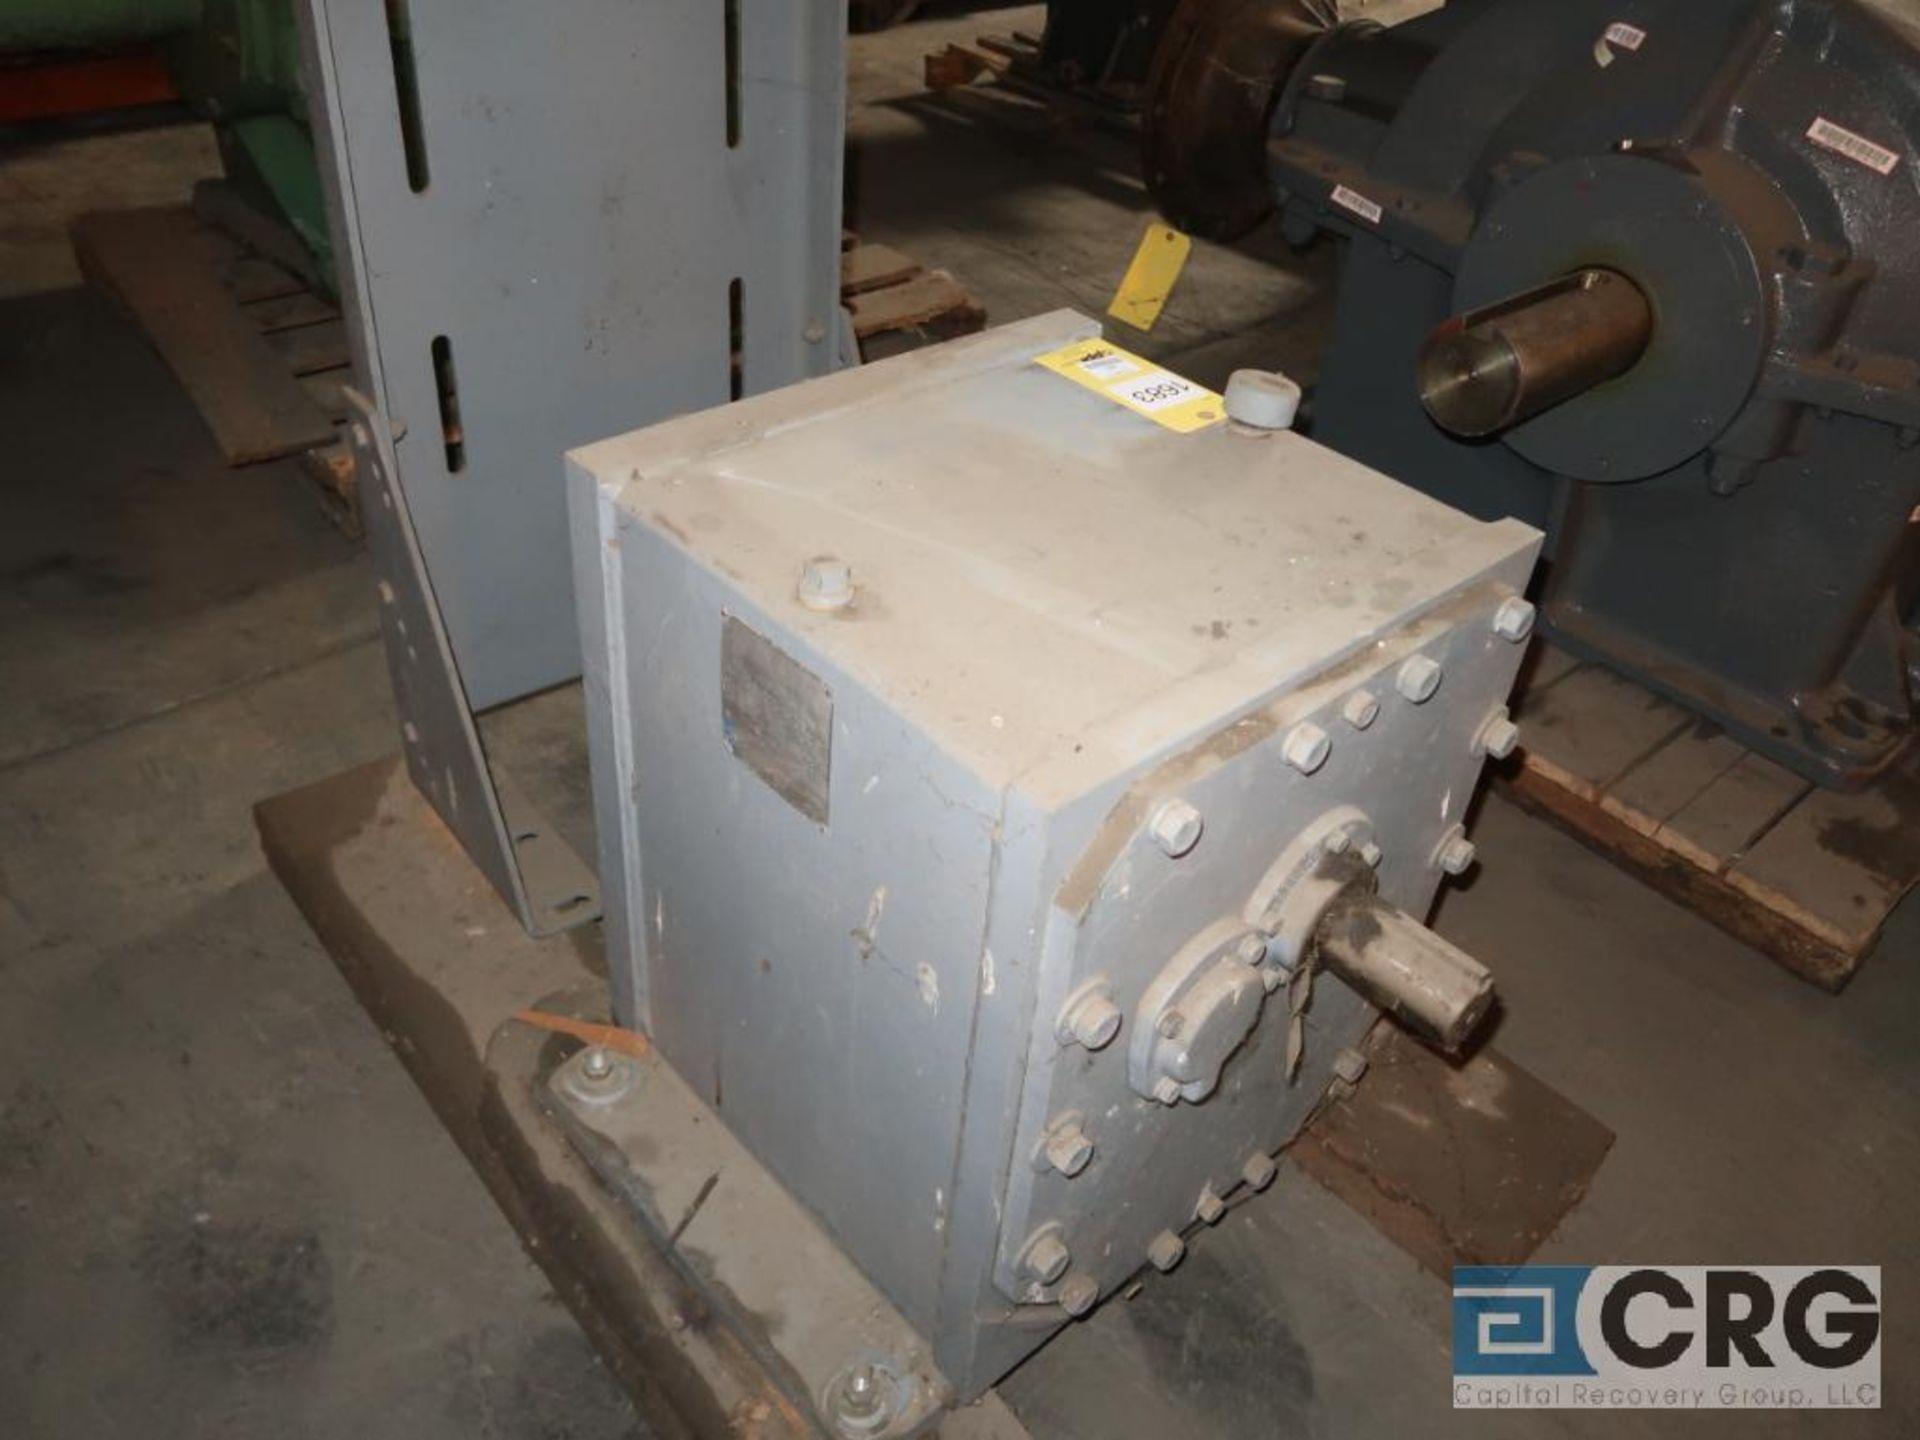 Falk 501 1090 FZ 3A gear drive, ratio 45.75, RPM 1,750, service rate HP. 75, s/n 20158 (Next Bay